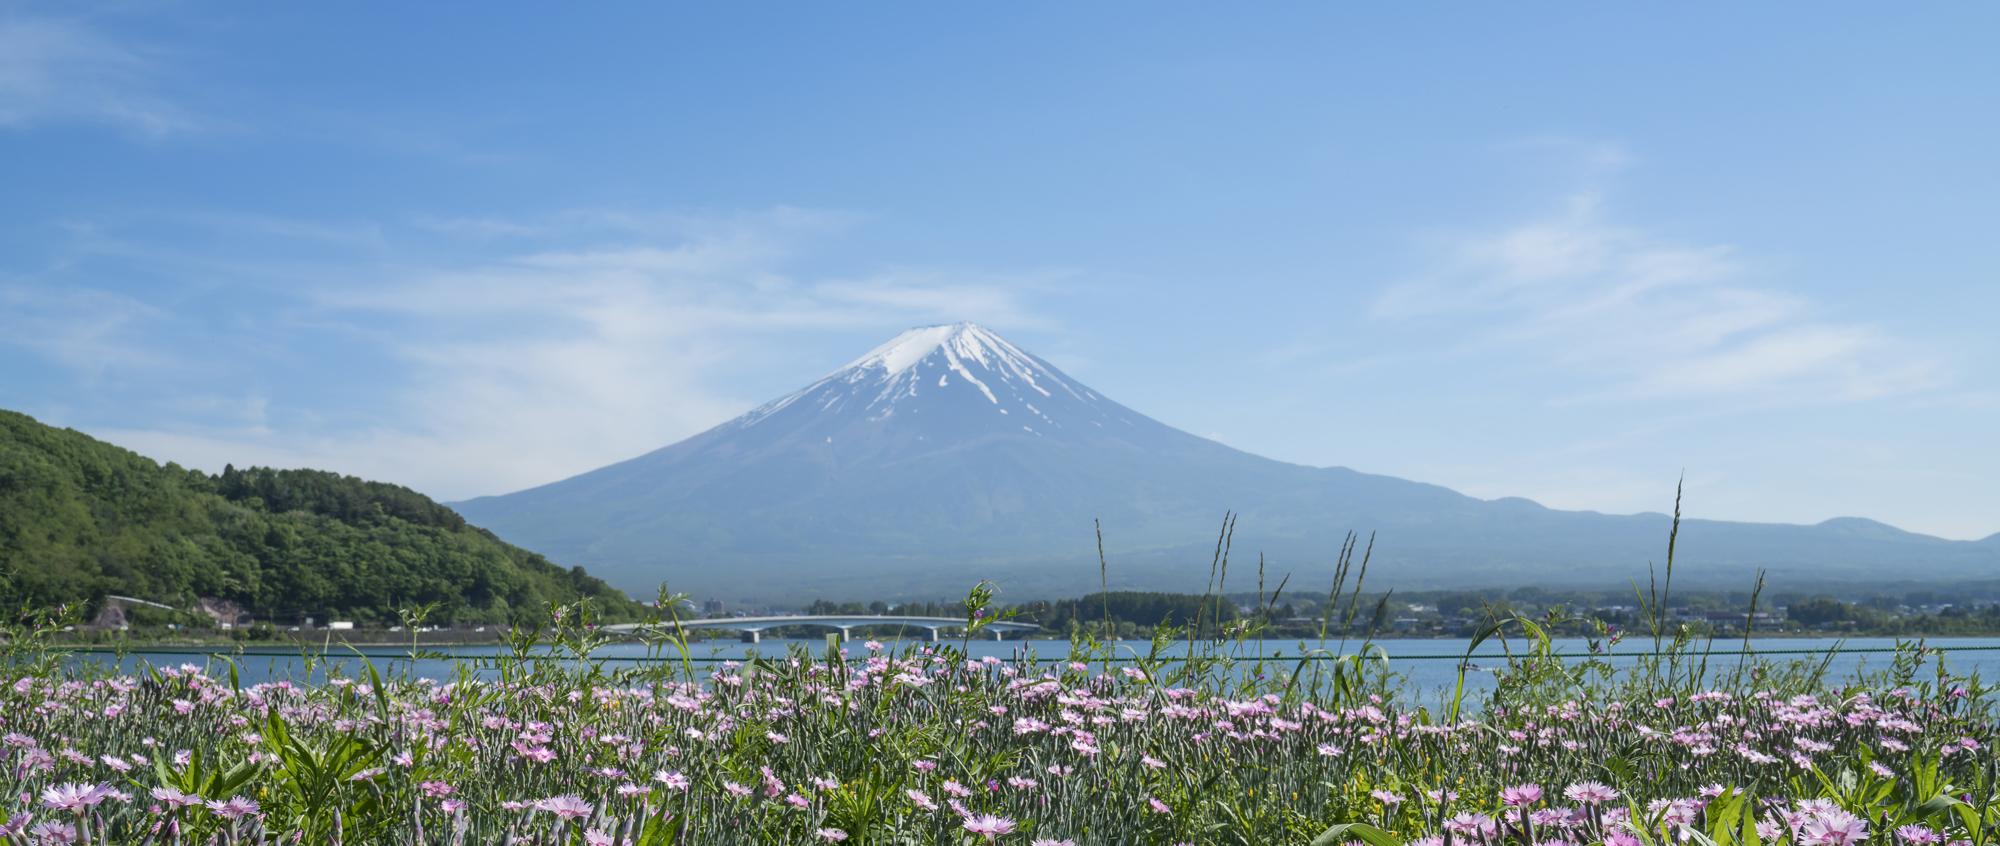 Mt Fuji Daisy 350cm x 147 Lustre_DSC6207.jpg